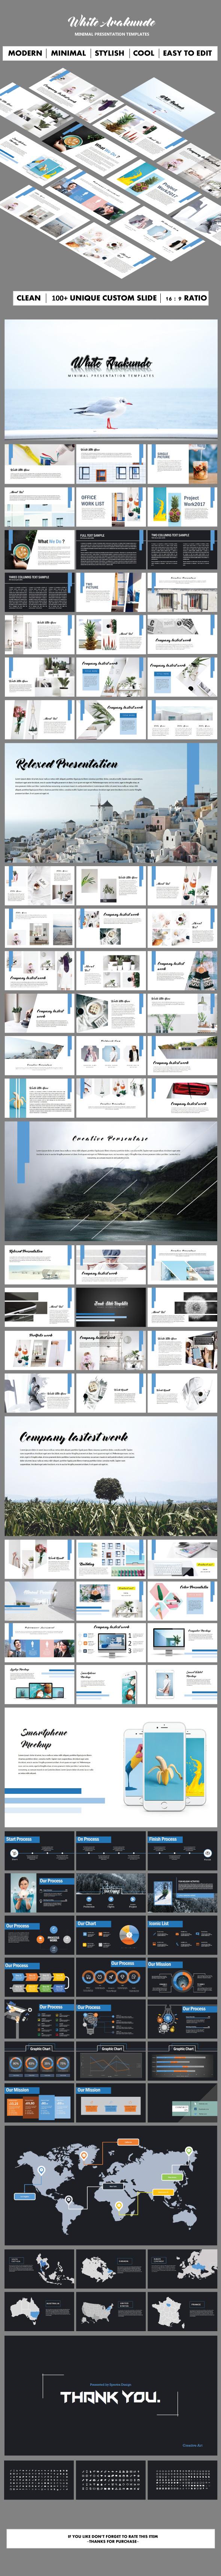 White Arakundo Keynote Templates - Keynote Templates Presentation Templates